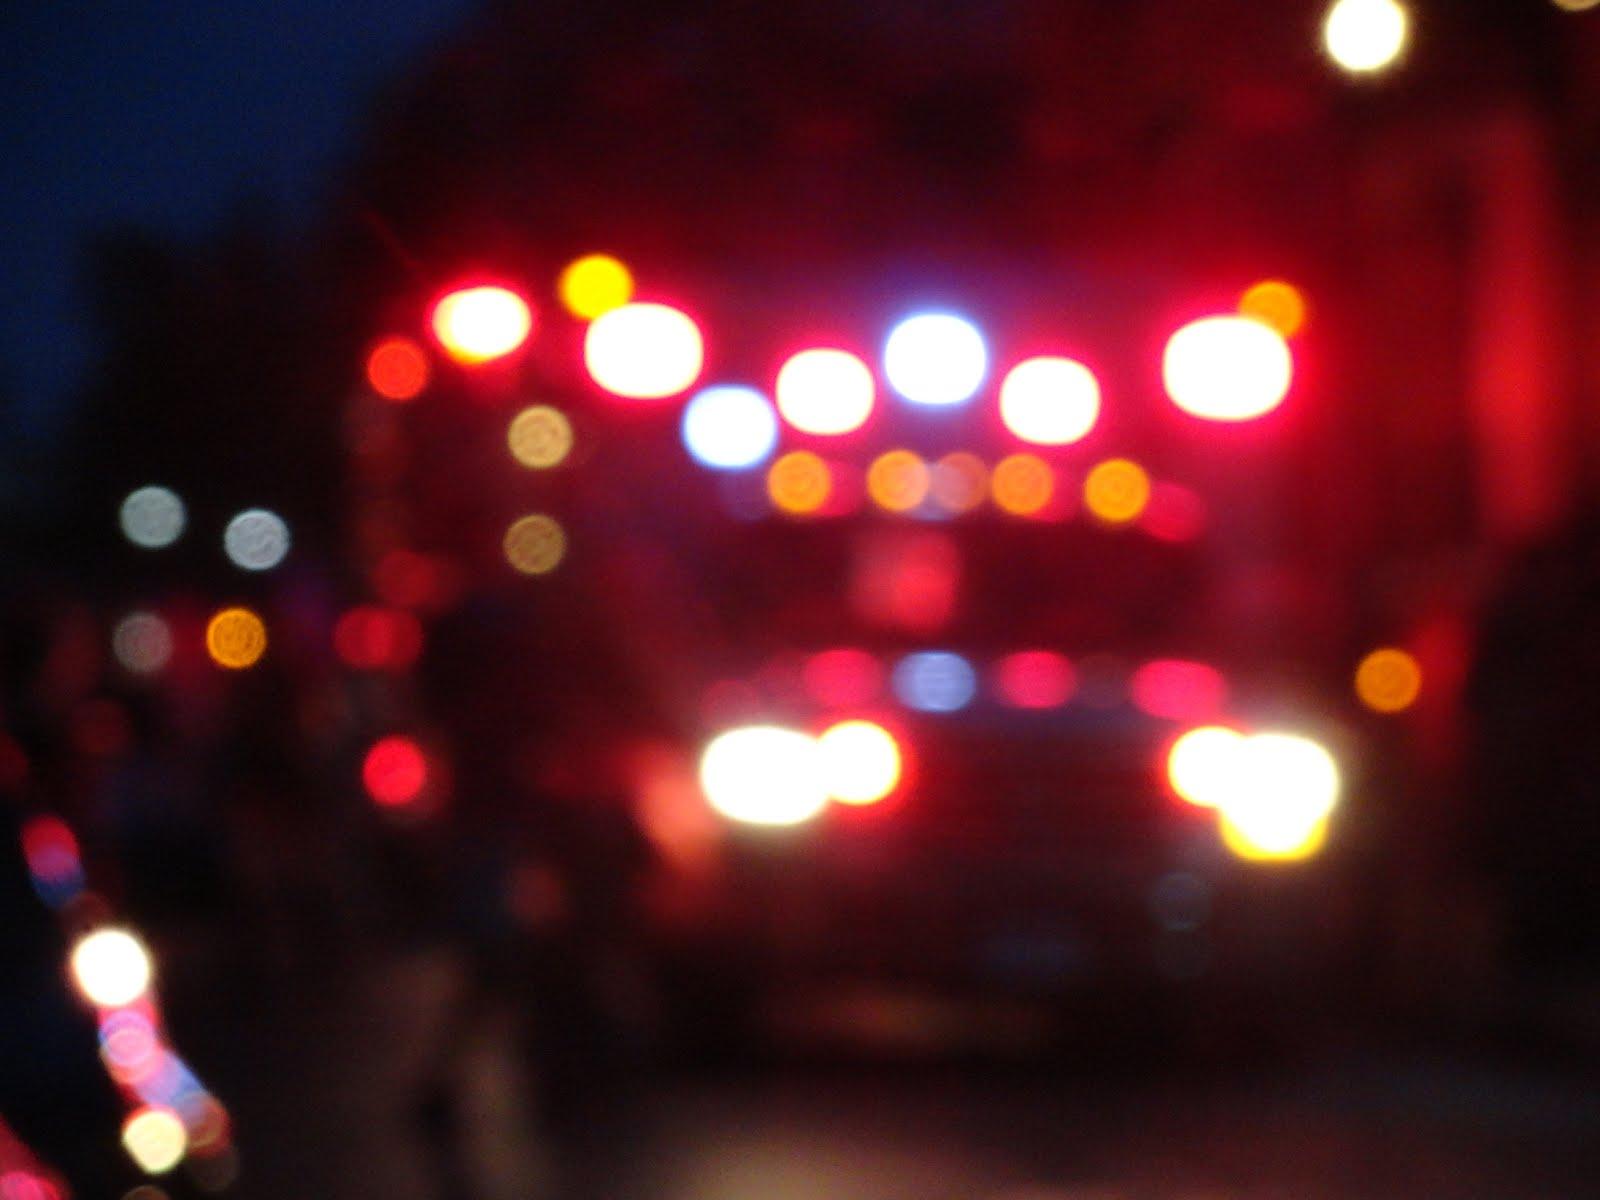 Ambulance Blur 2